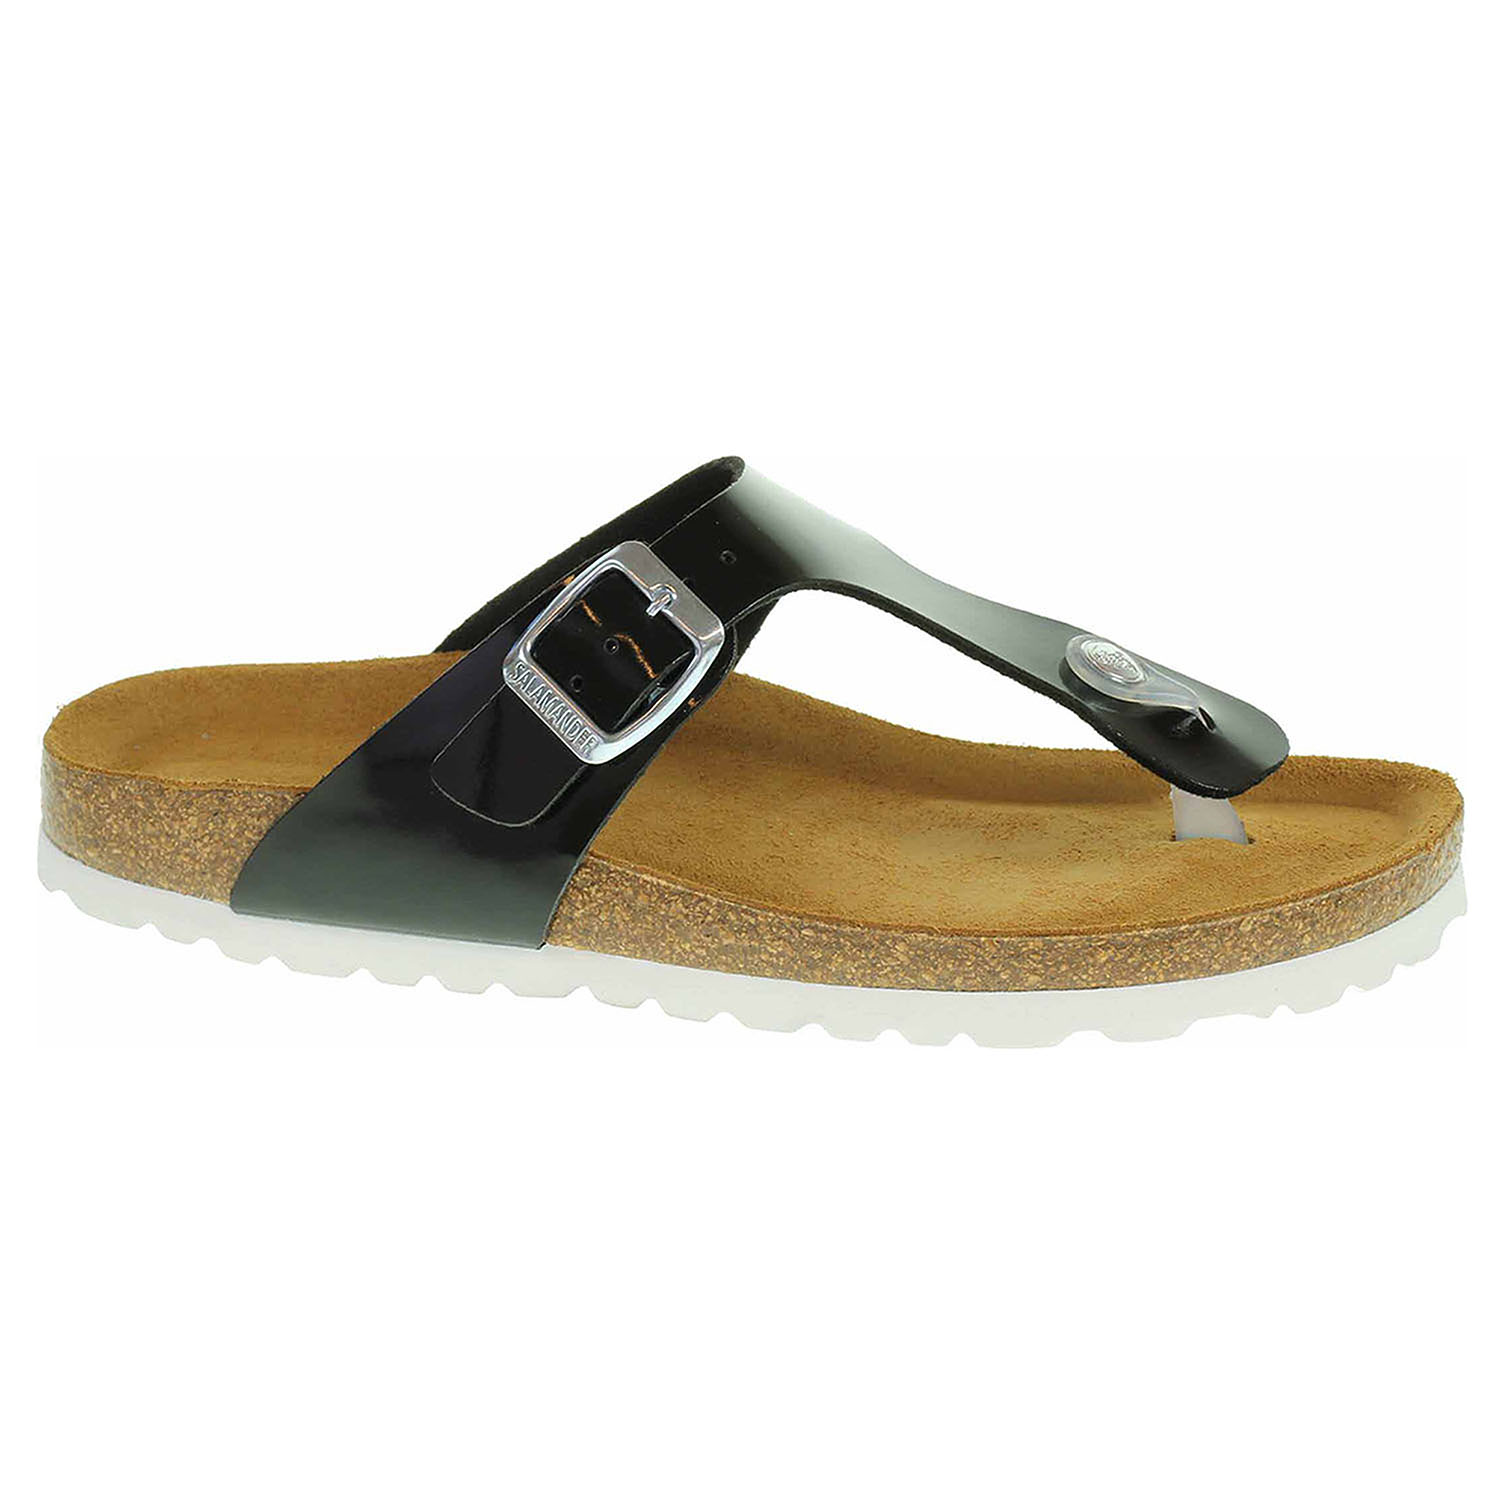 Dámské pantofle Salamander 32-13007-41 black 32-13007-41 37